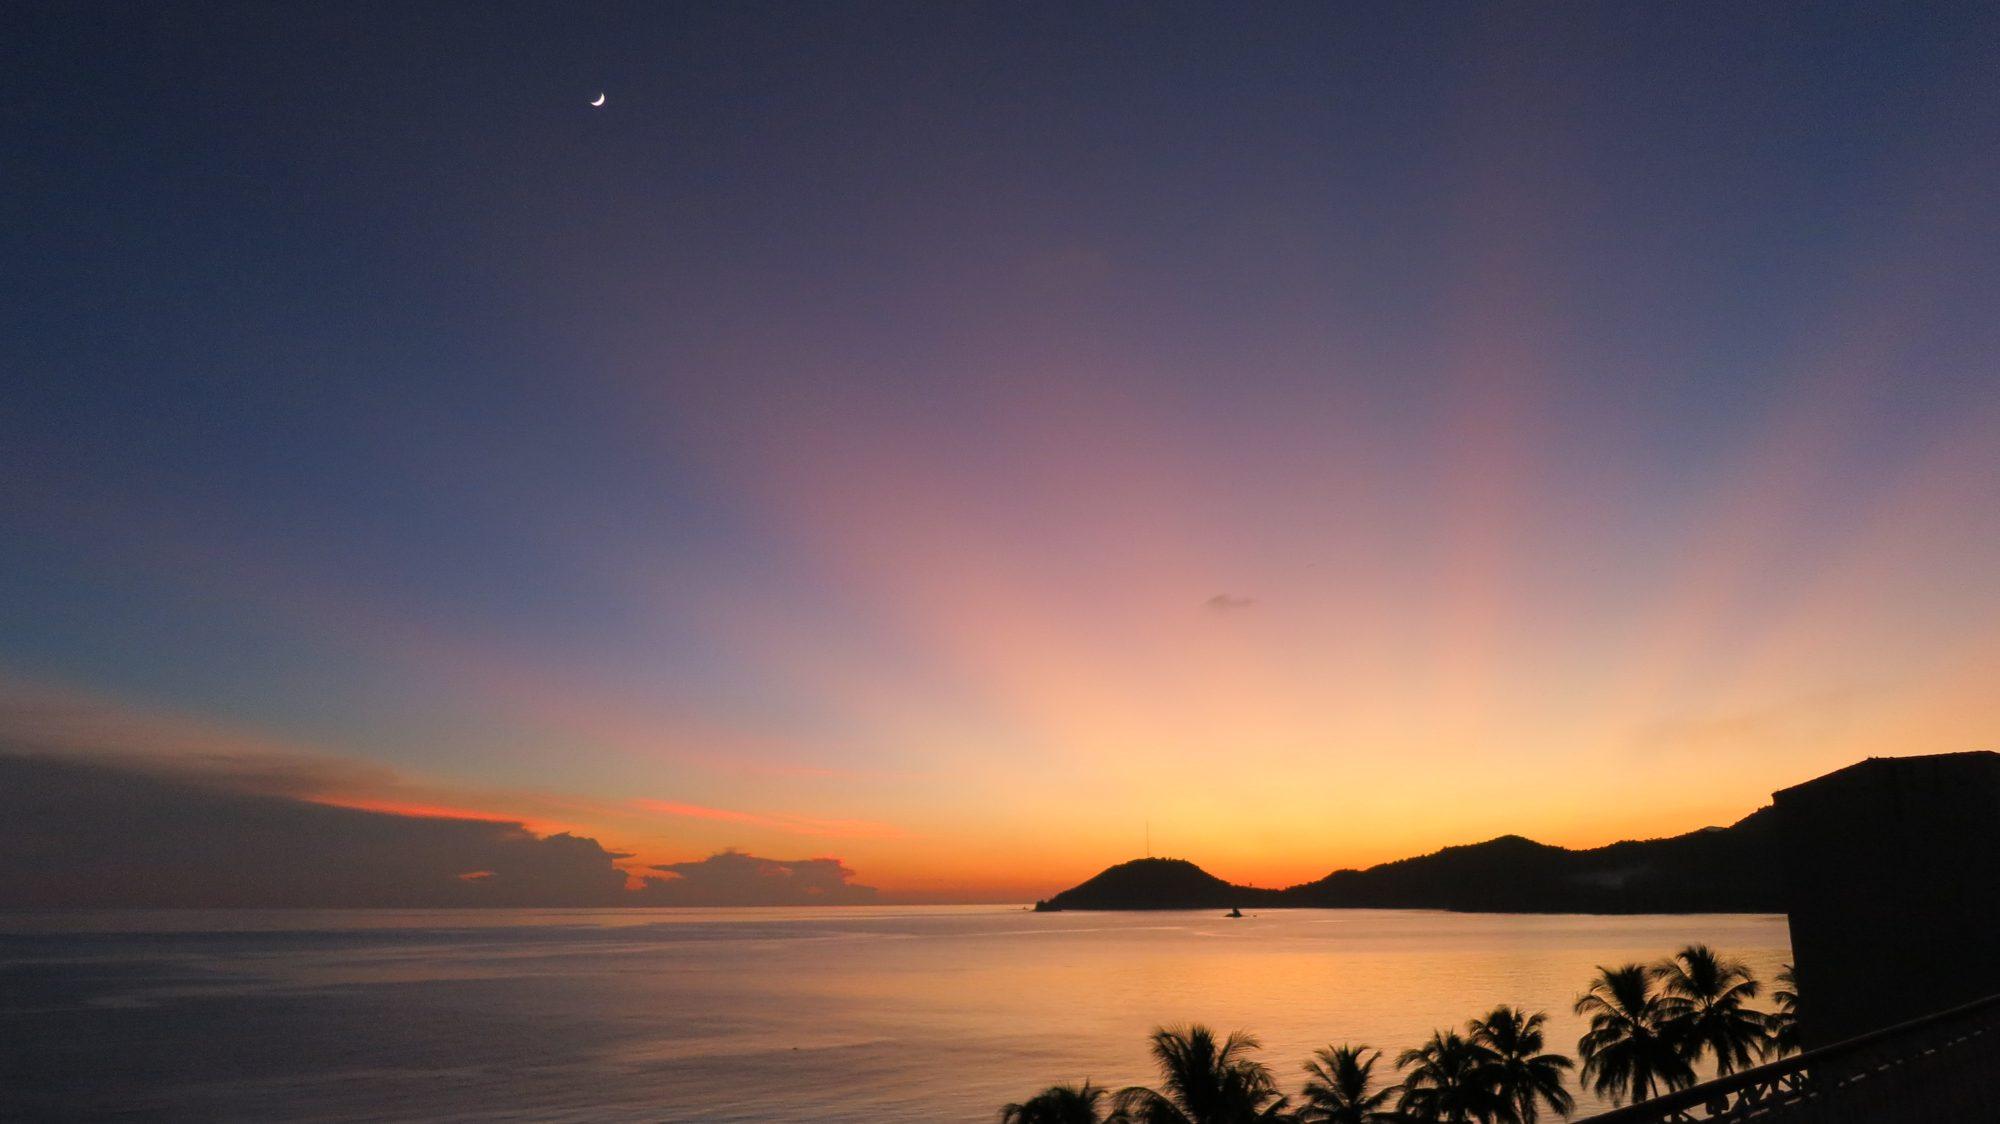 sunset in cuba photo